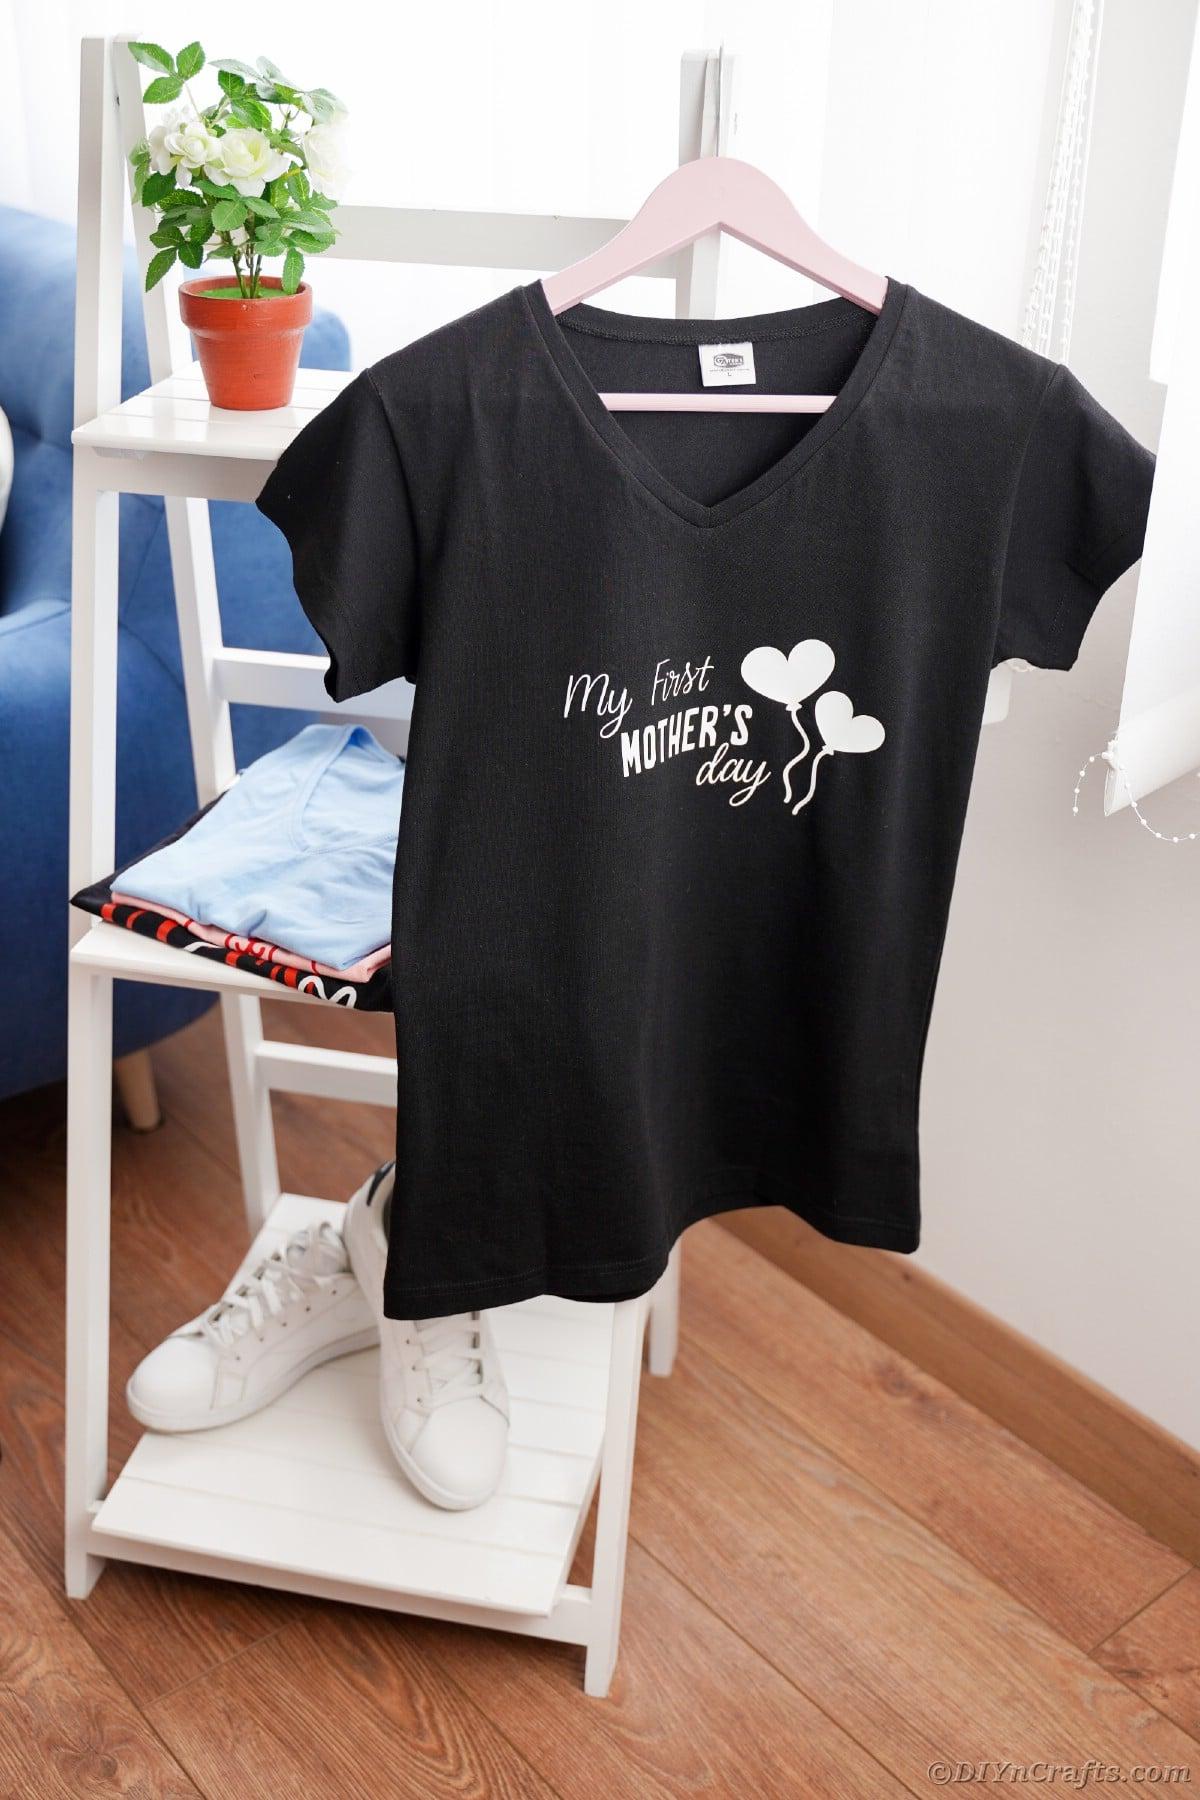 Black tshirt hanging on white shelf